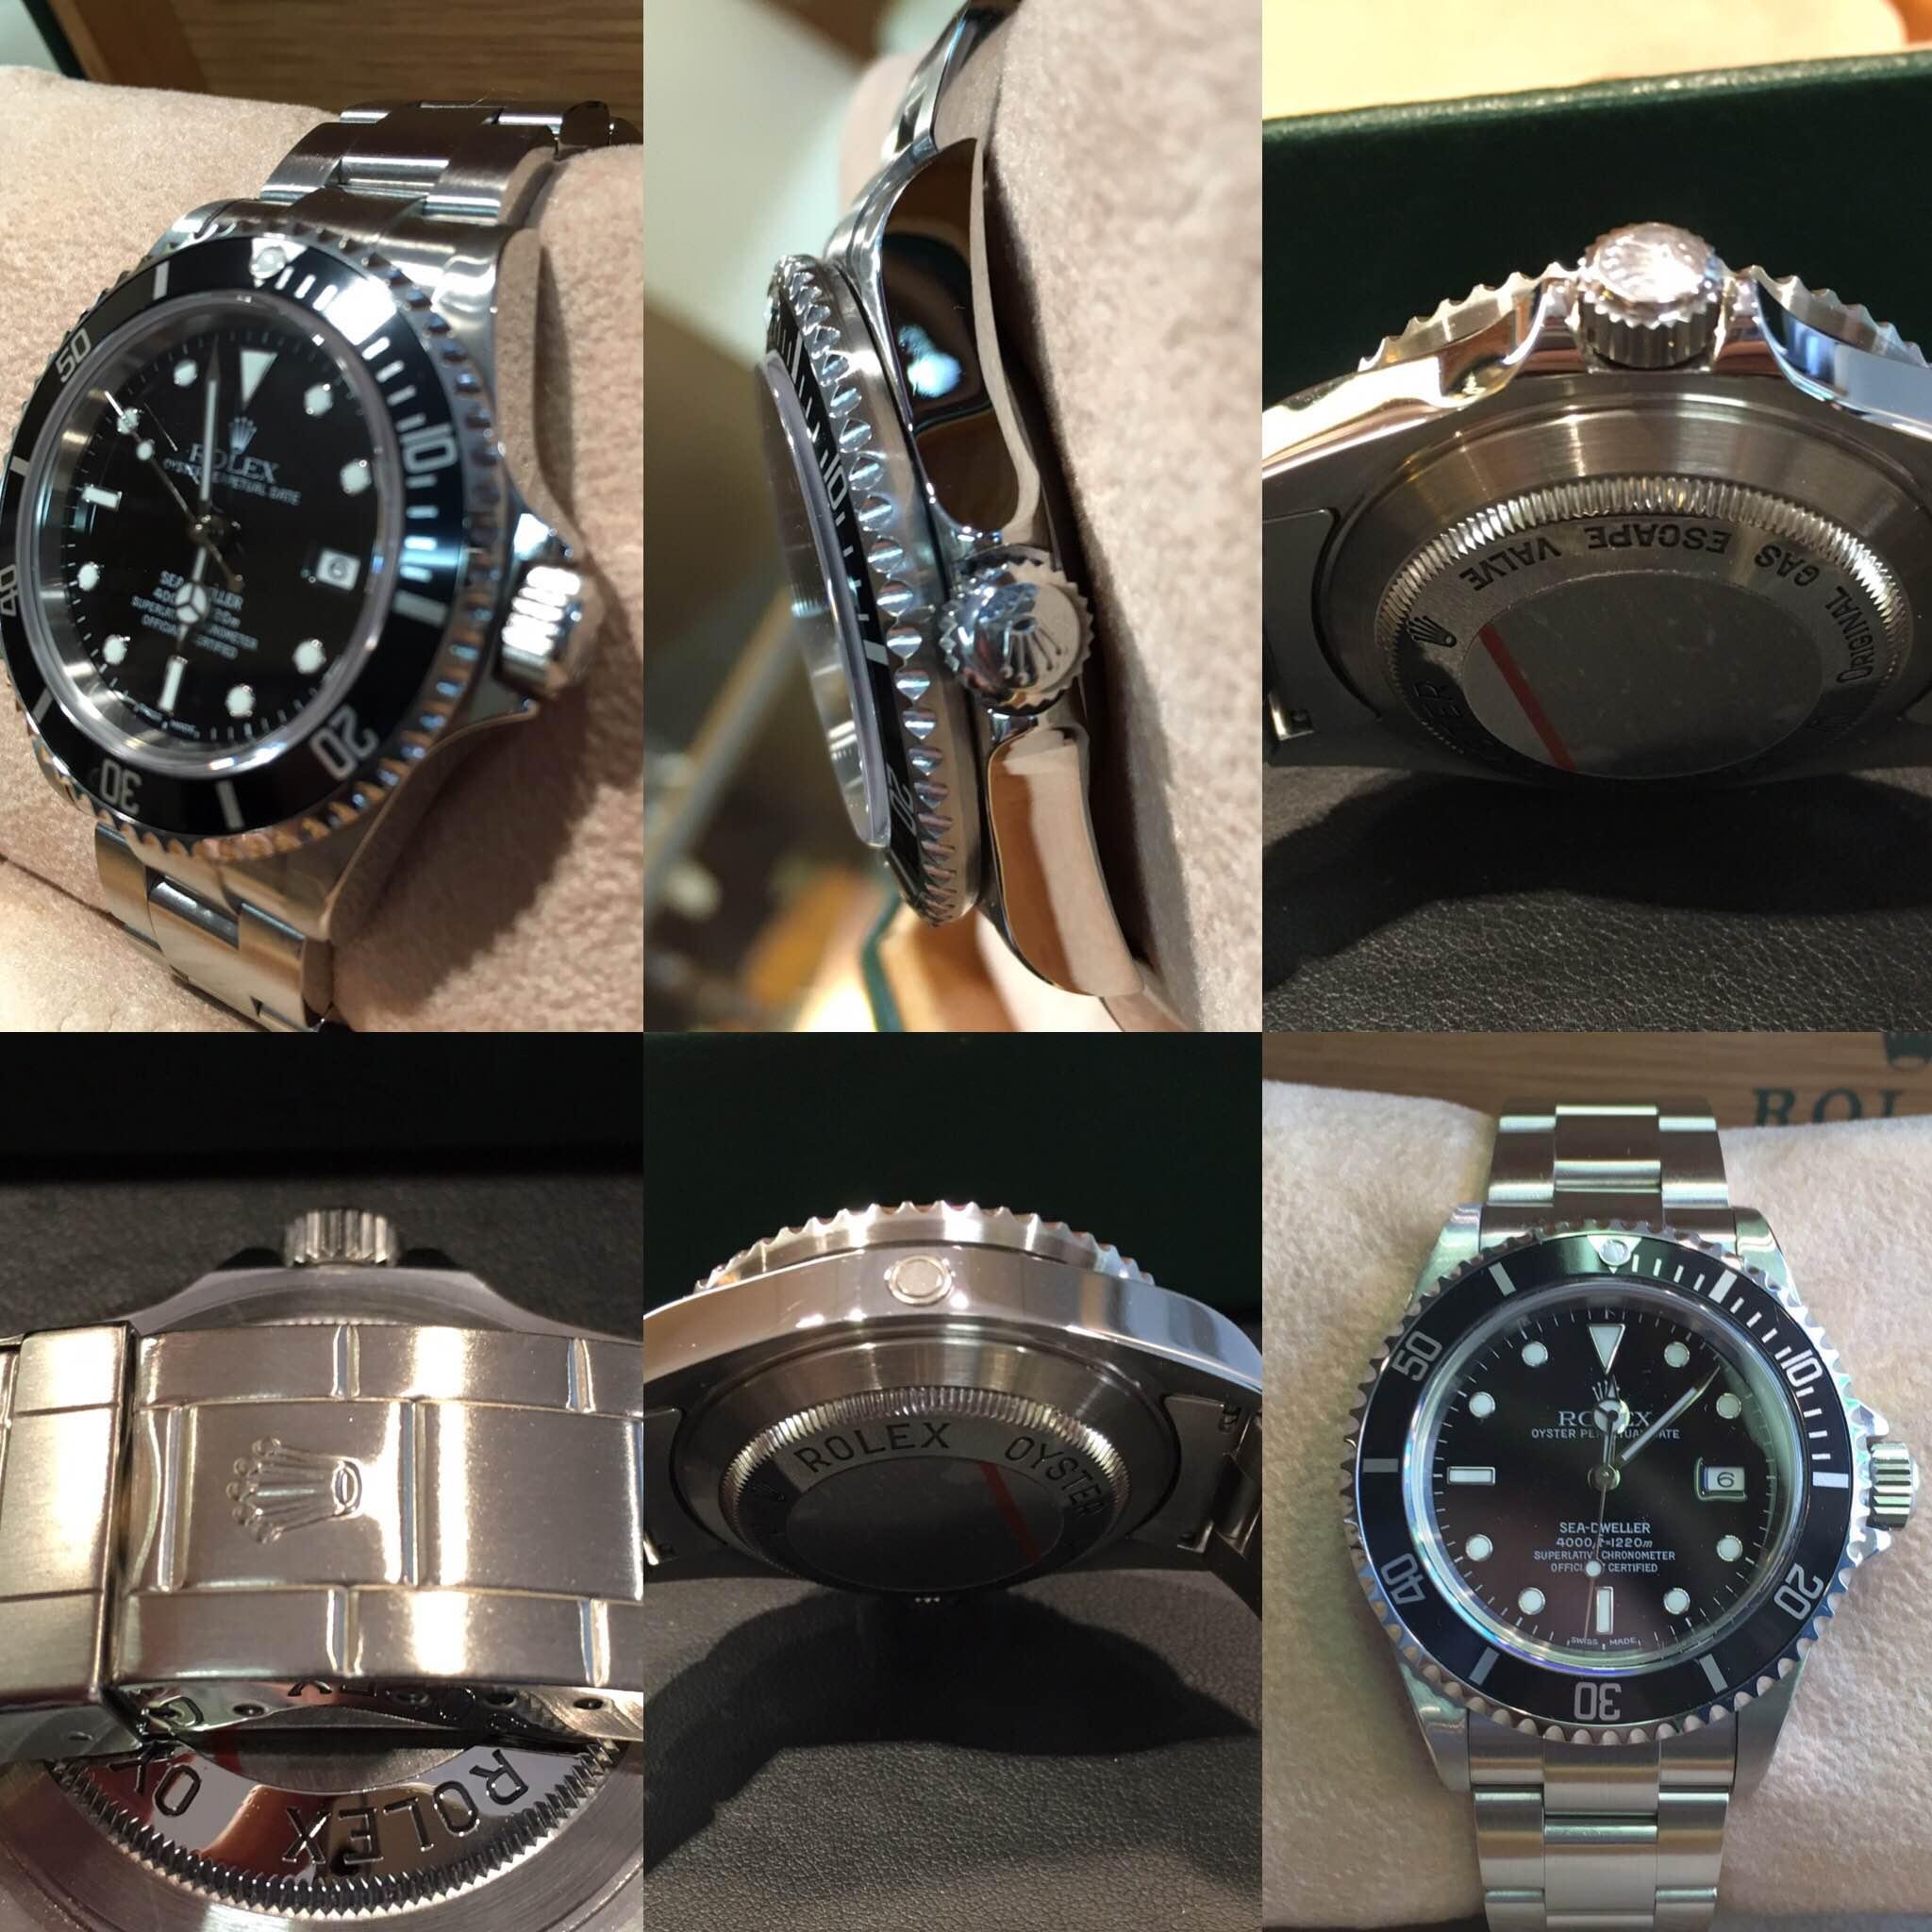 Gioielleria Bianchi - Rolex 1